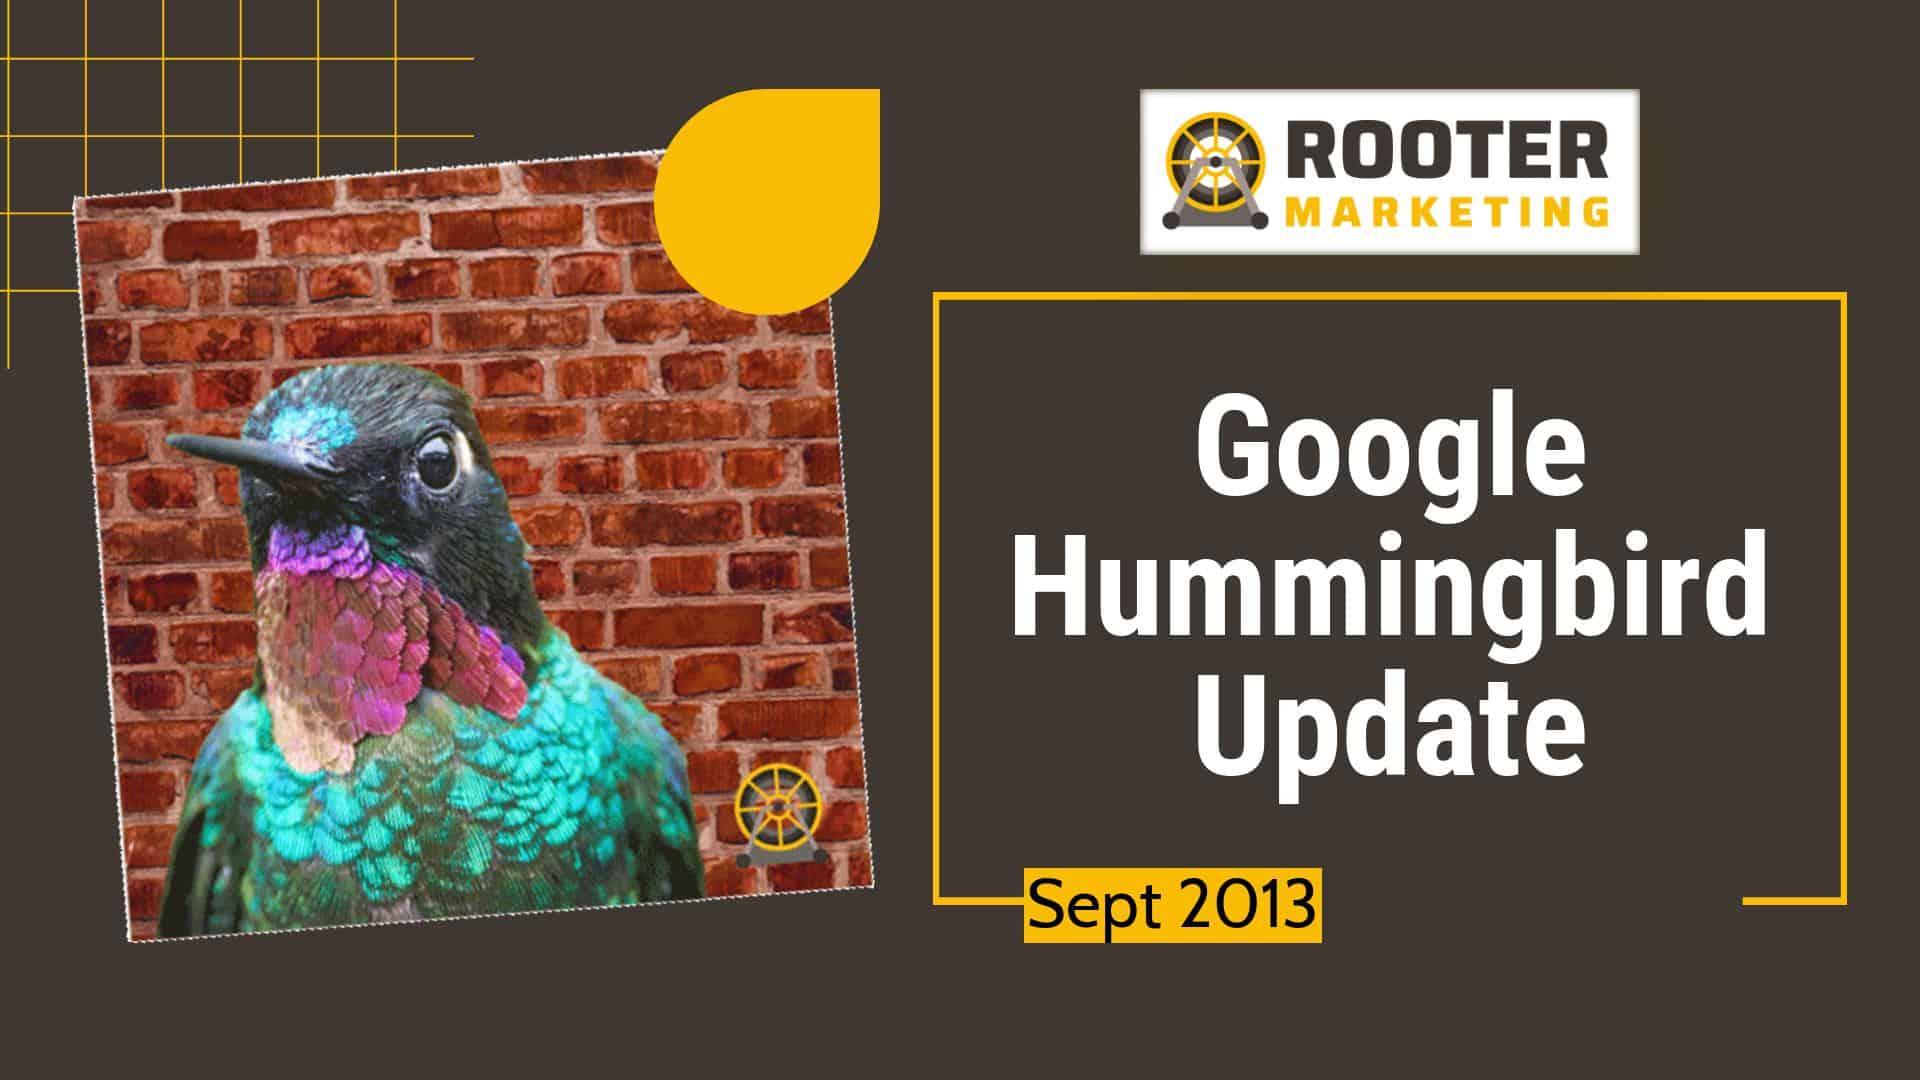 Google SEO Hummingbird Update Rooter Marketing Plumbing SEO